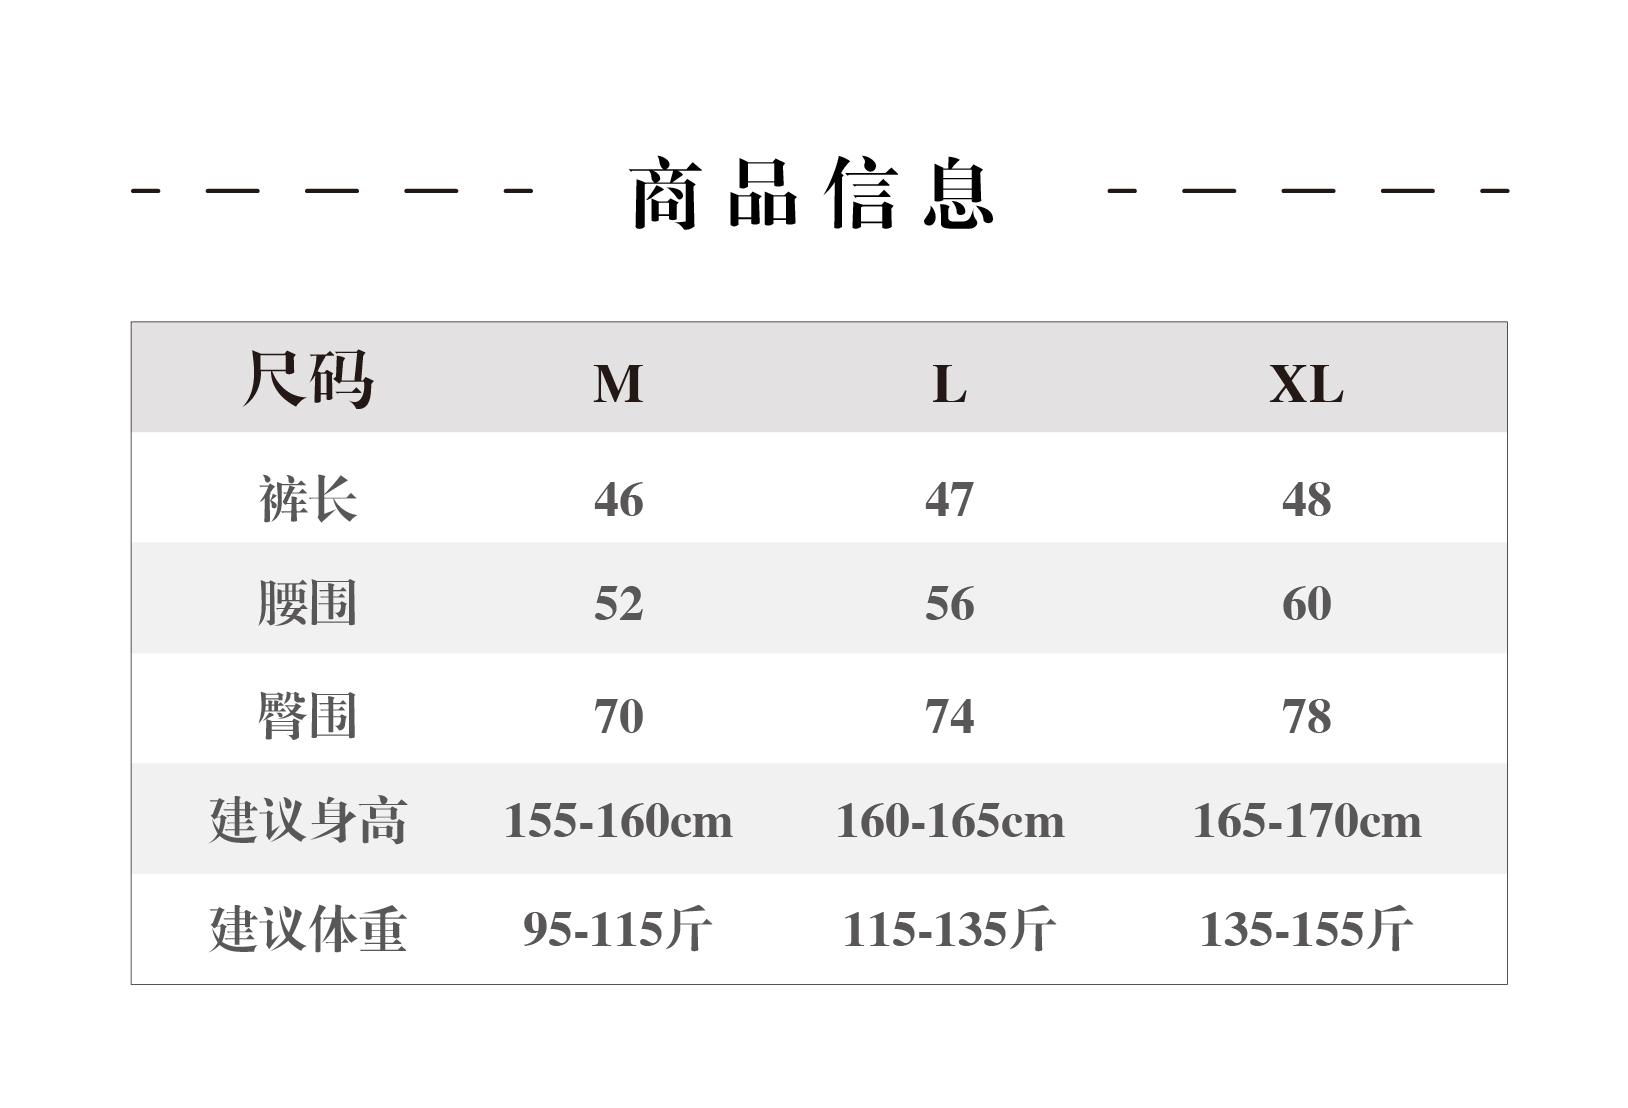 J005 高腰动感悬浮裤BH512 No.1